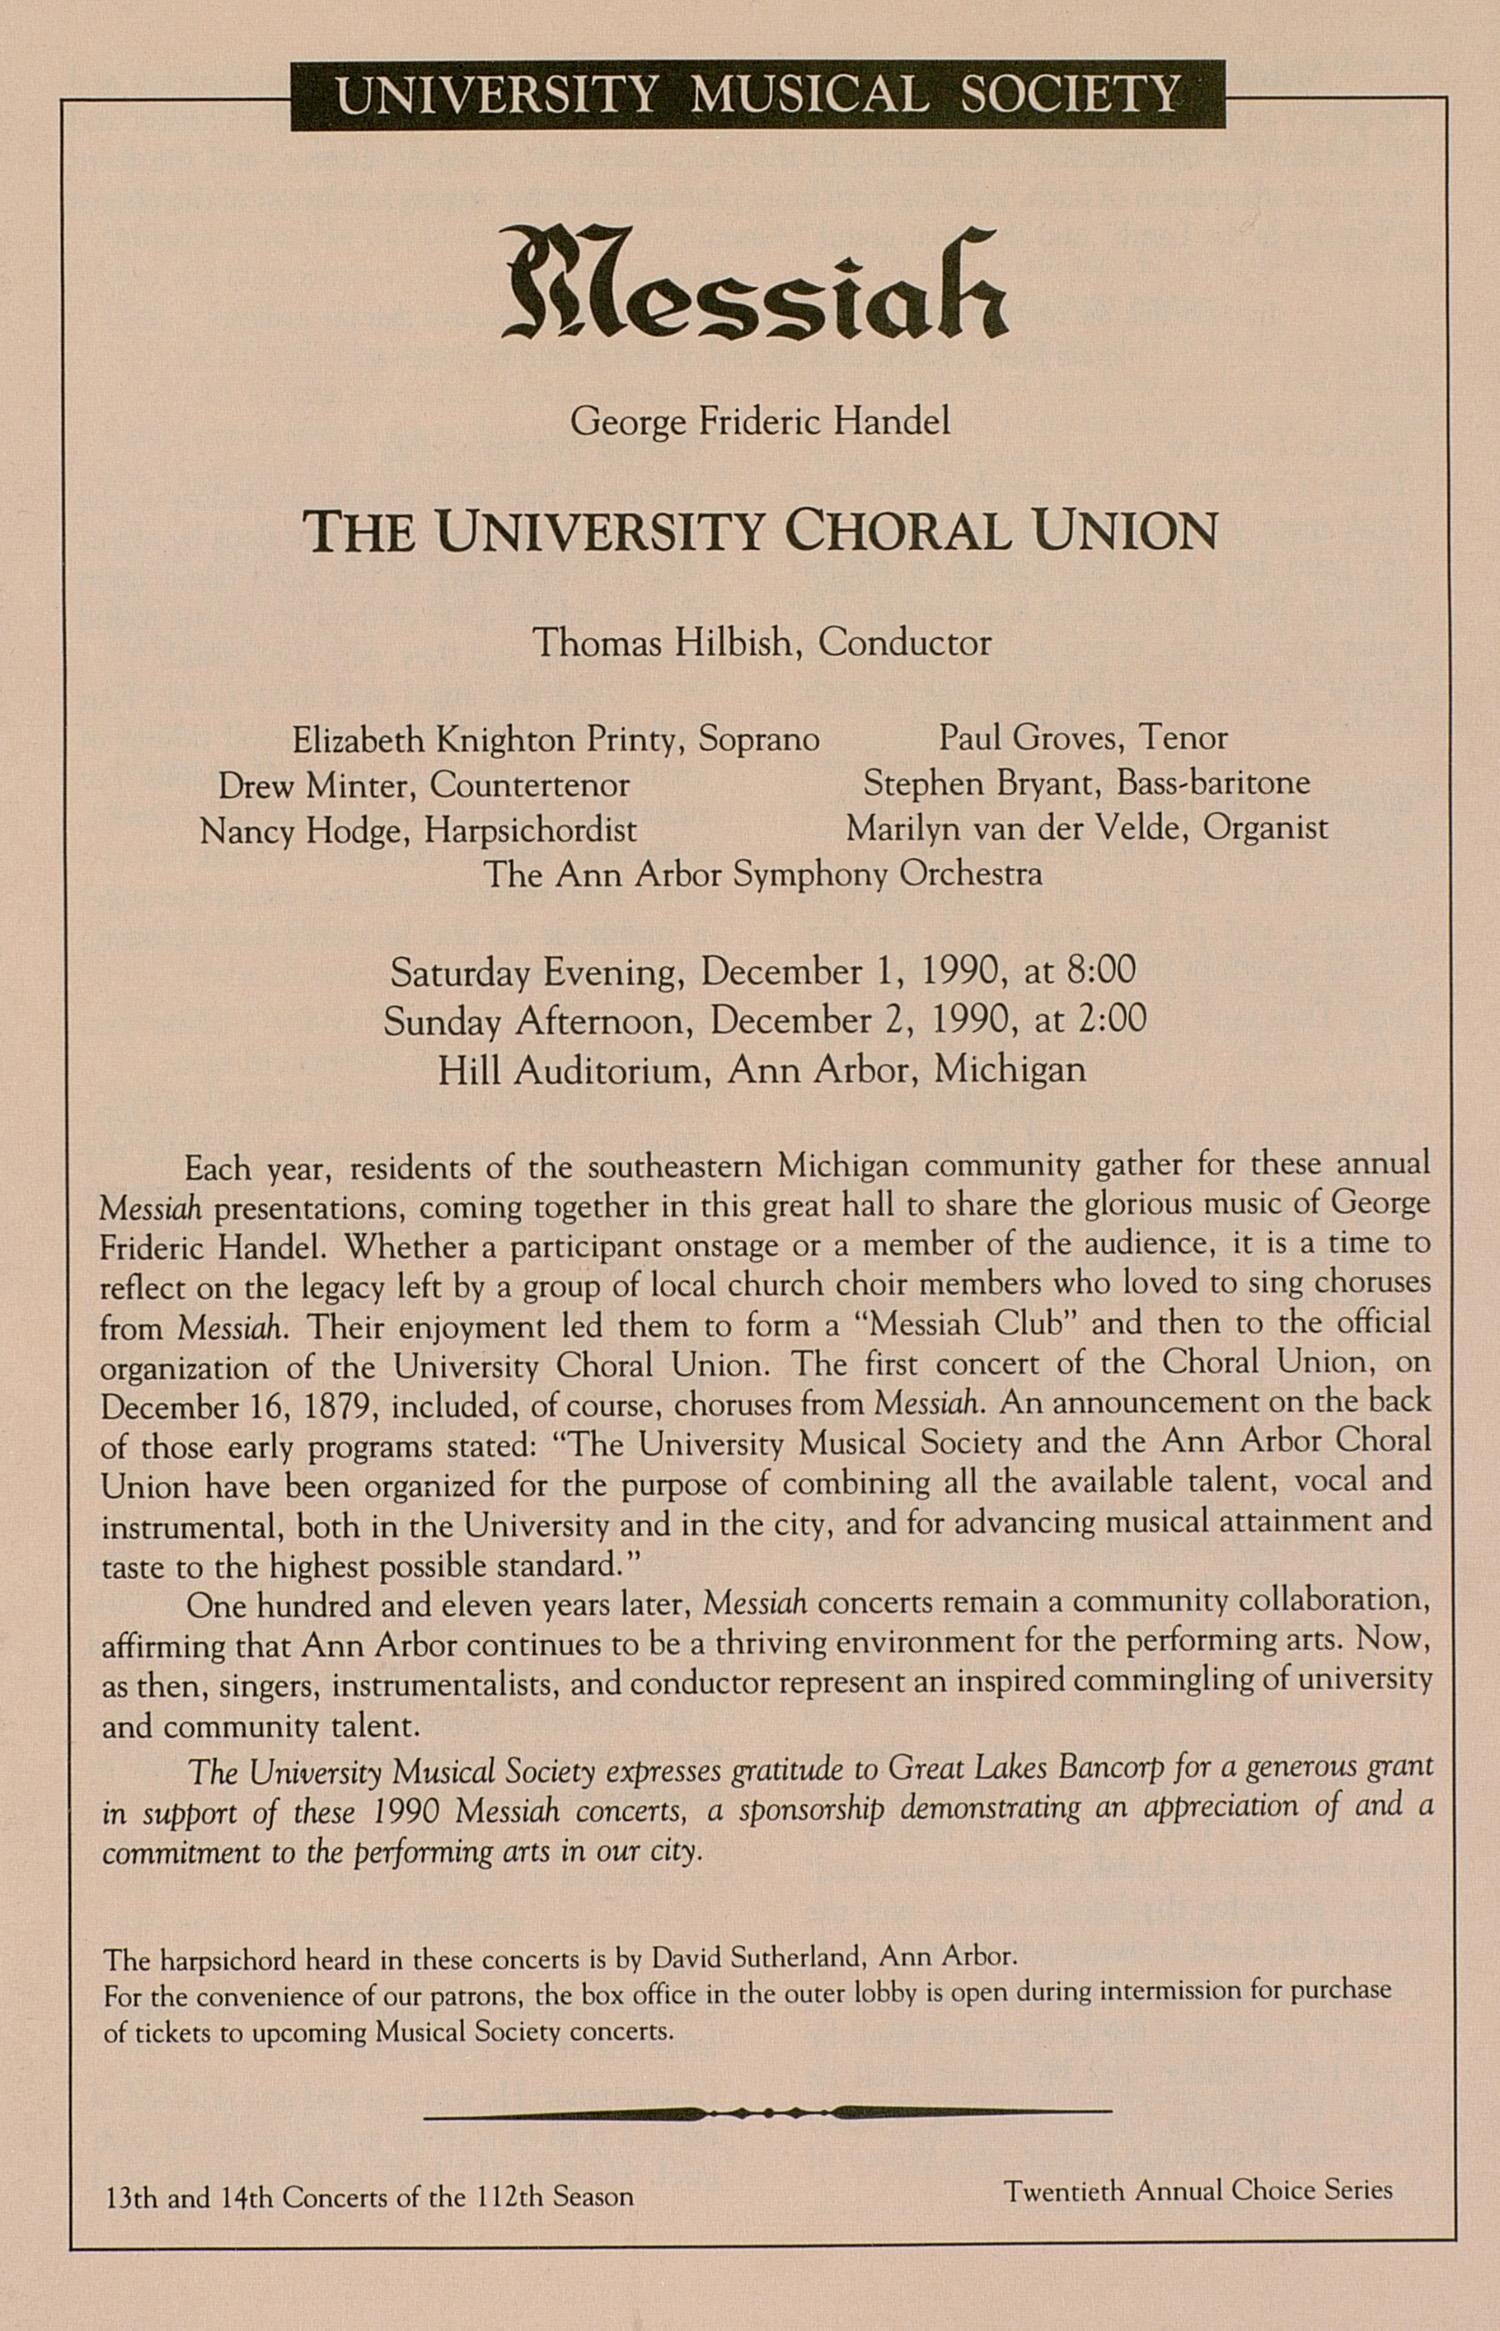 UMS Concert Program, December 1-2, 1990: Messiah -- George Frideric Handel